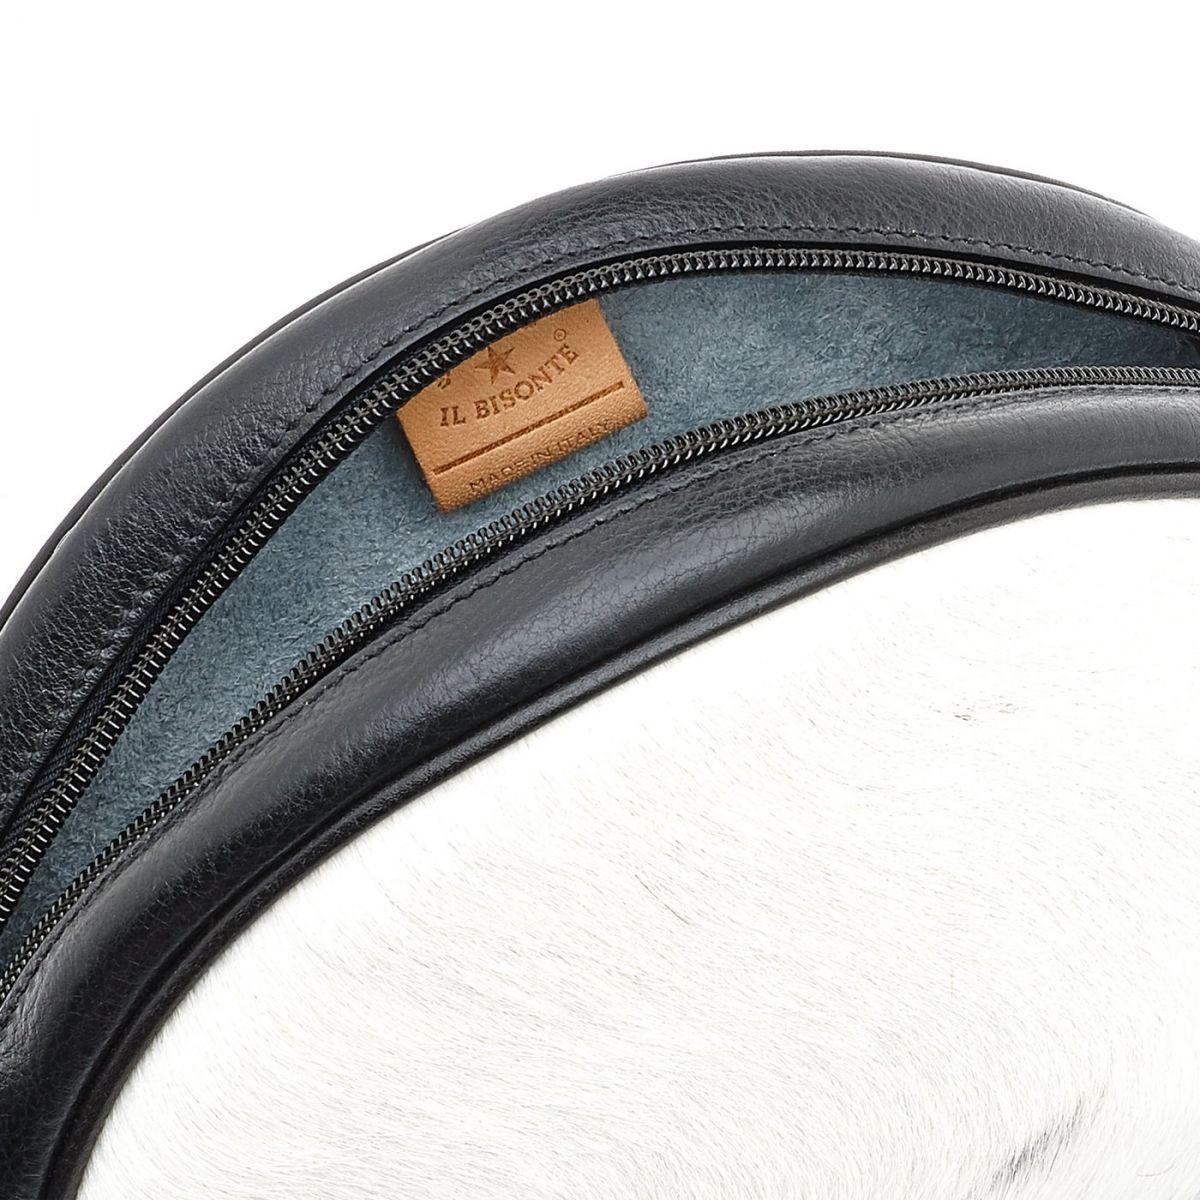 Disco Bag - Women's Crossbody Bag  in Cowhide Leather BCR094 color Dappled/Black | Details